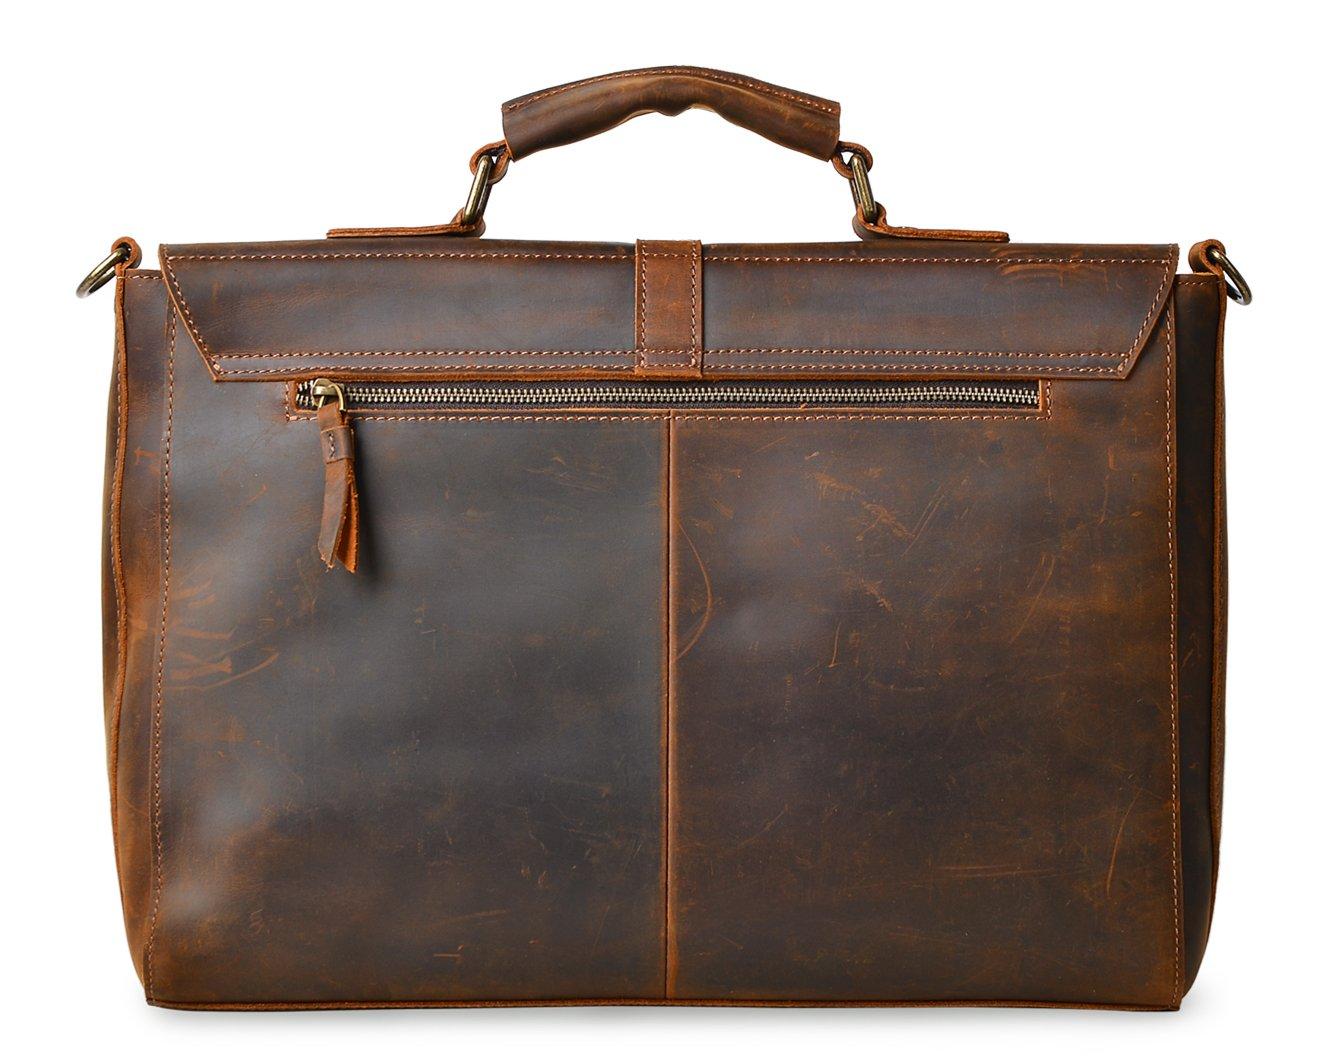 ALTOSY Vintage Genuine Leather Business Laptop Briefcase Office Shoulder Bag 8127 (Brown) by Altosy (Image #3)